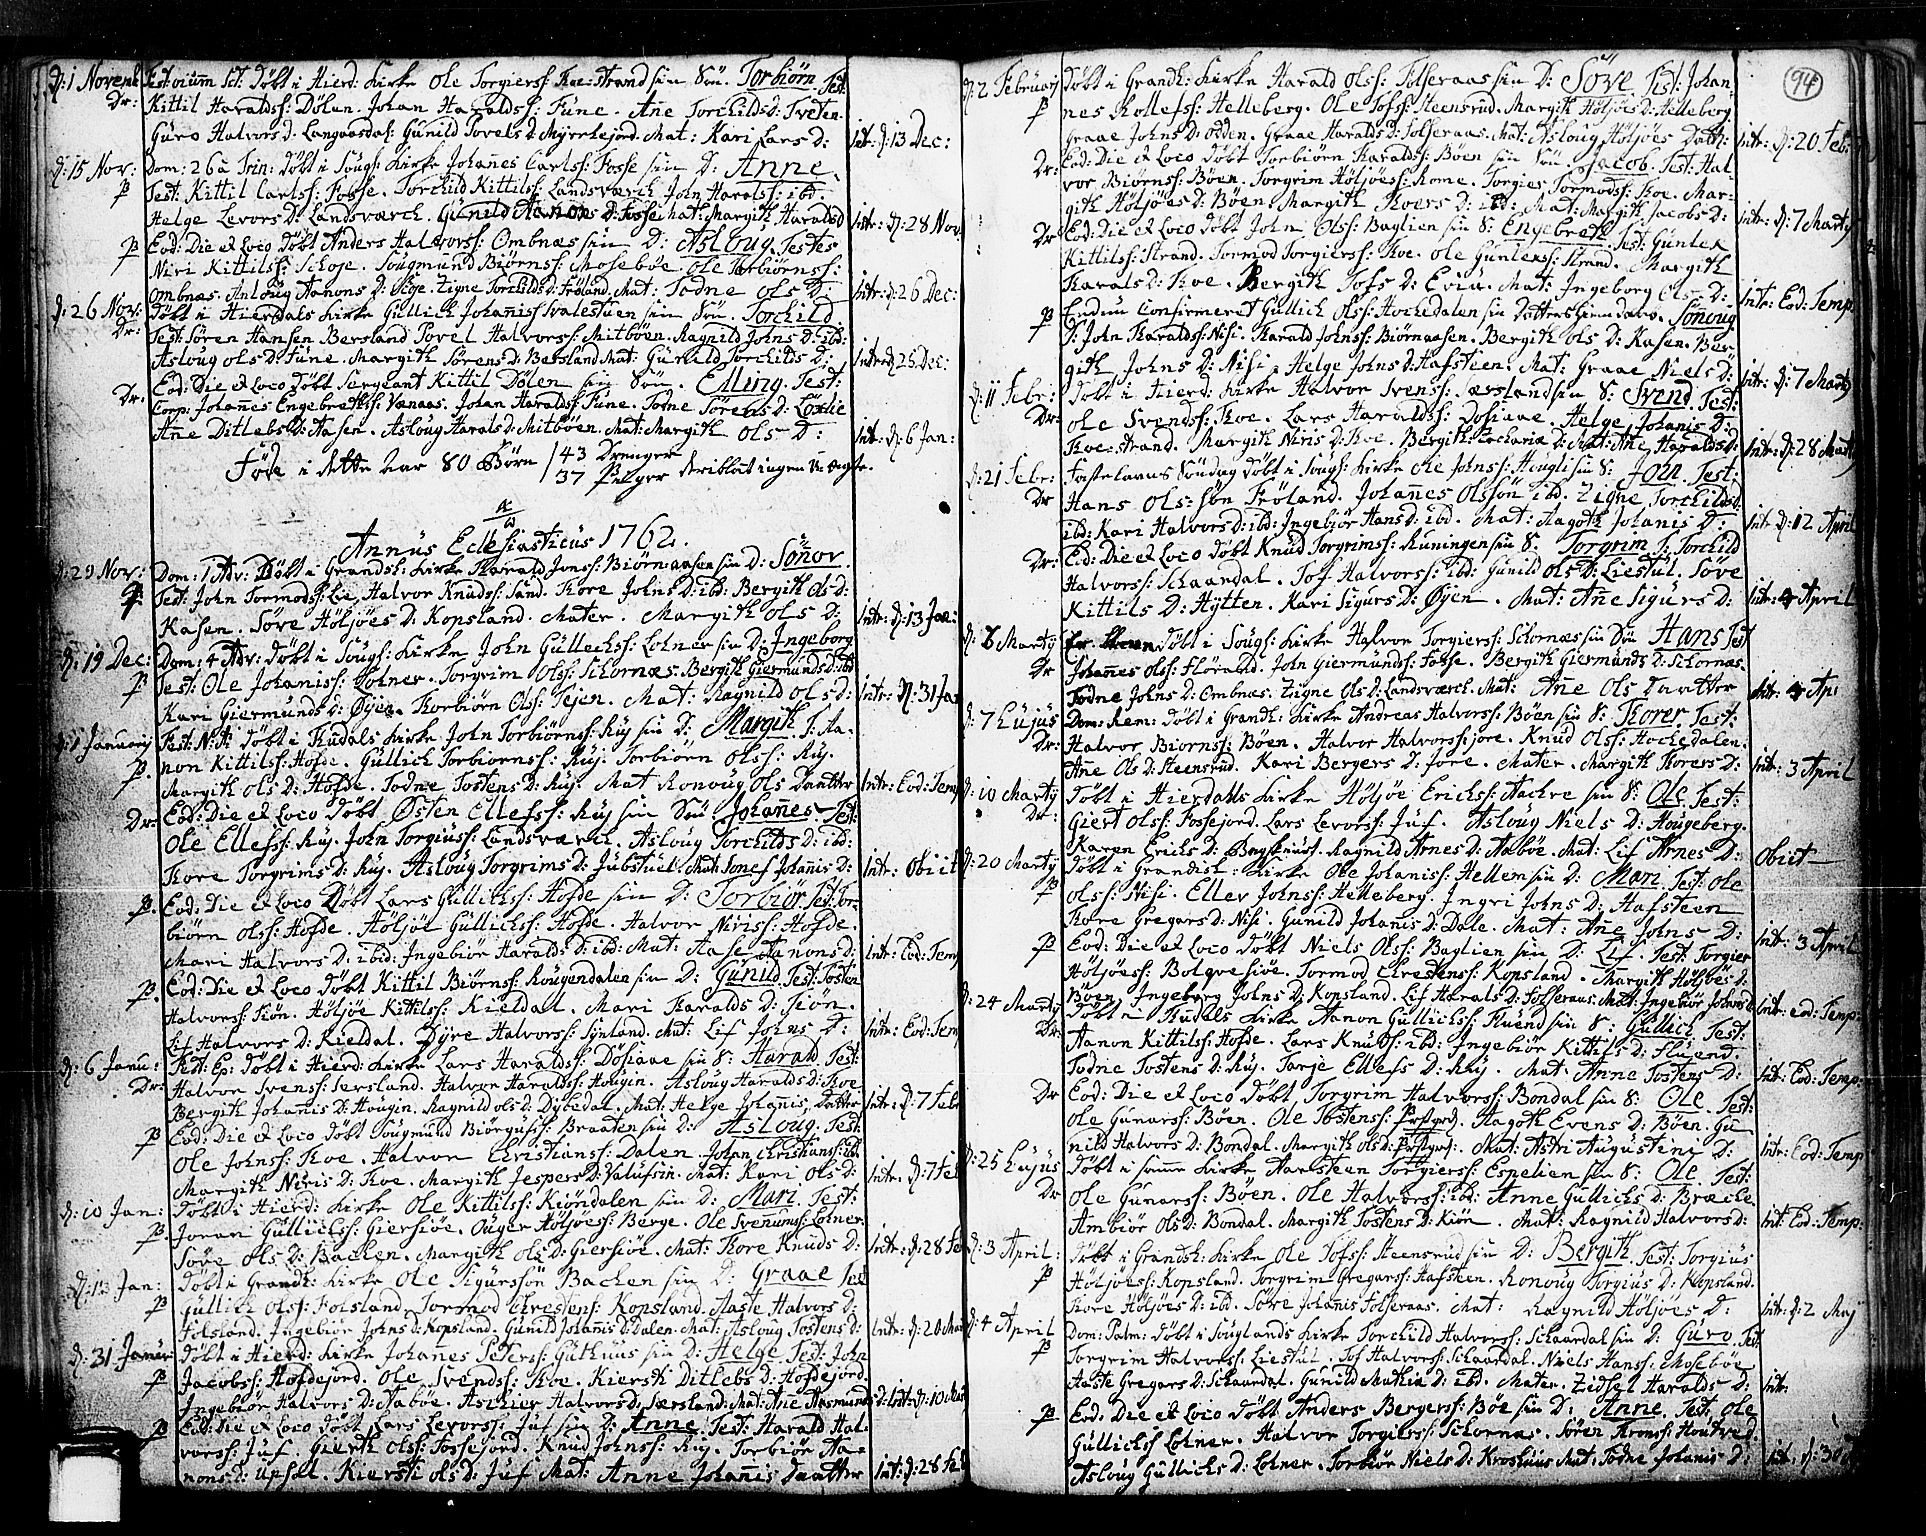 SAKO, Hjartdal kirkebøker, F/Fa/L0003: Ministerialbok nr. I 3, 1727-1775, s. 94